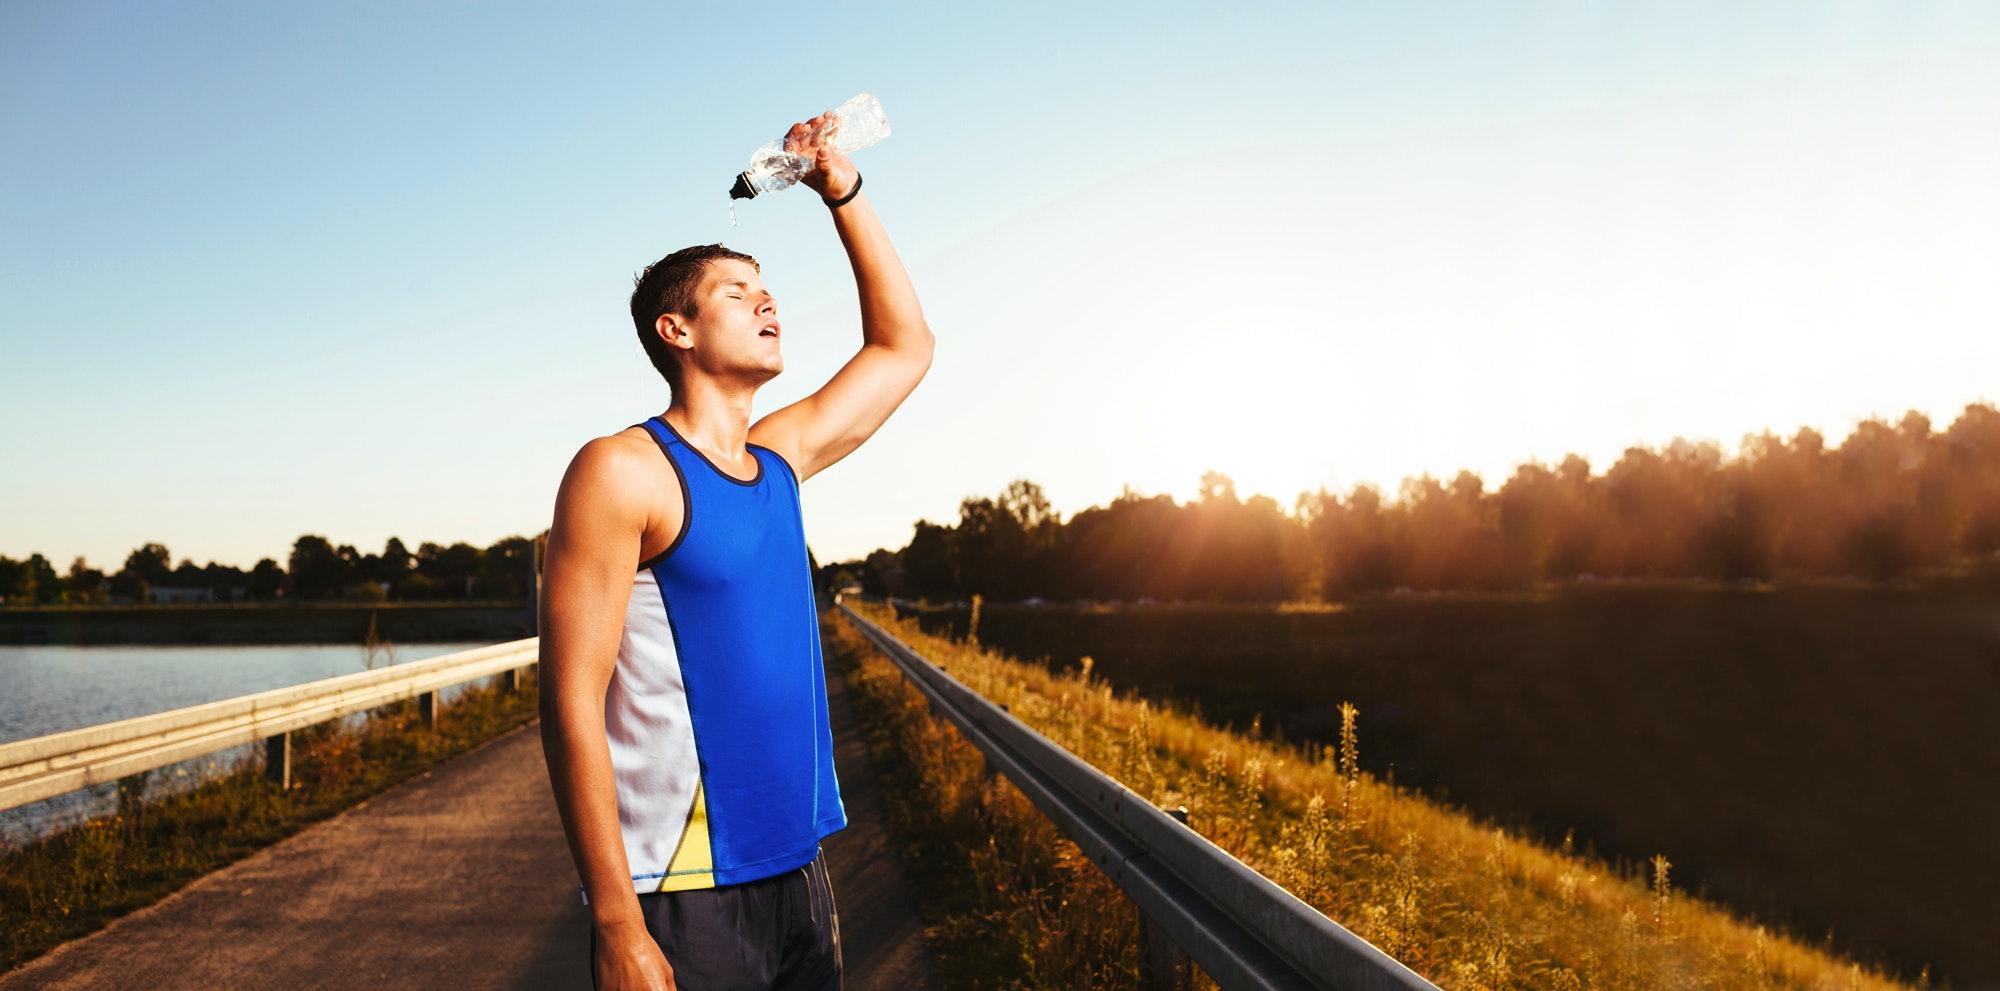 kalorieberegner løb